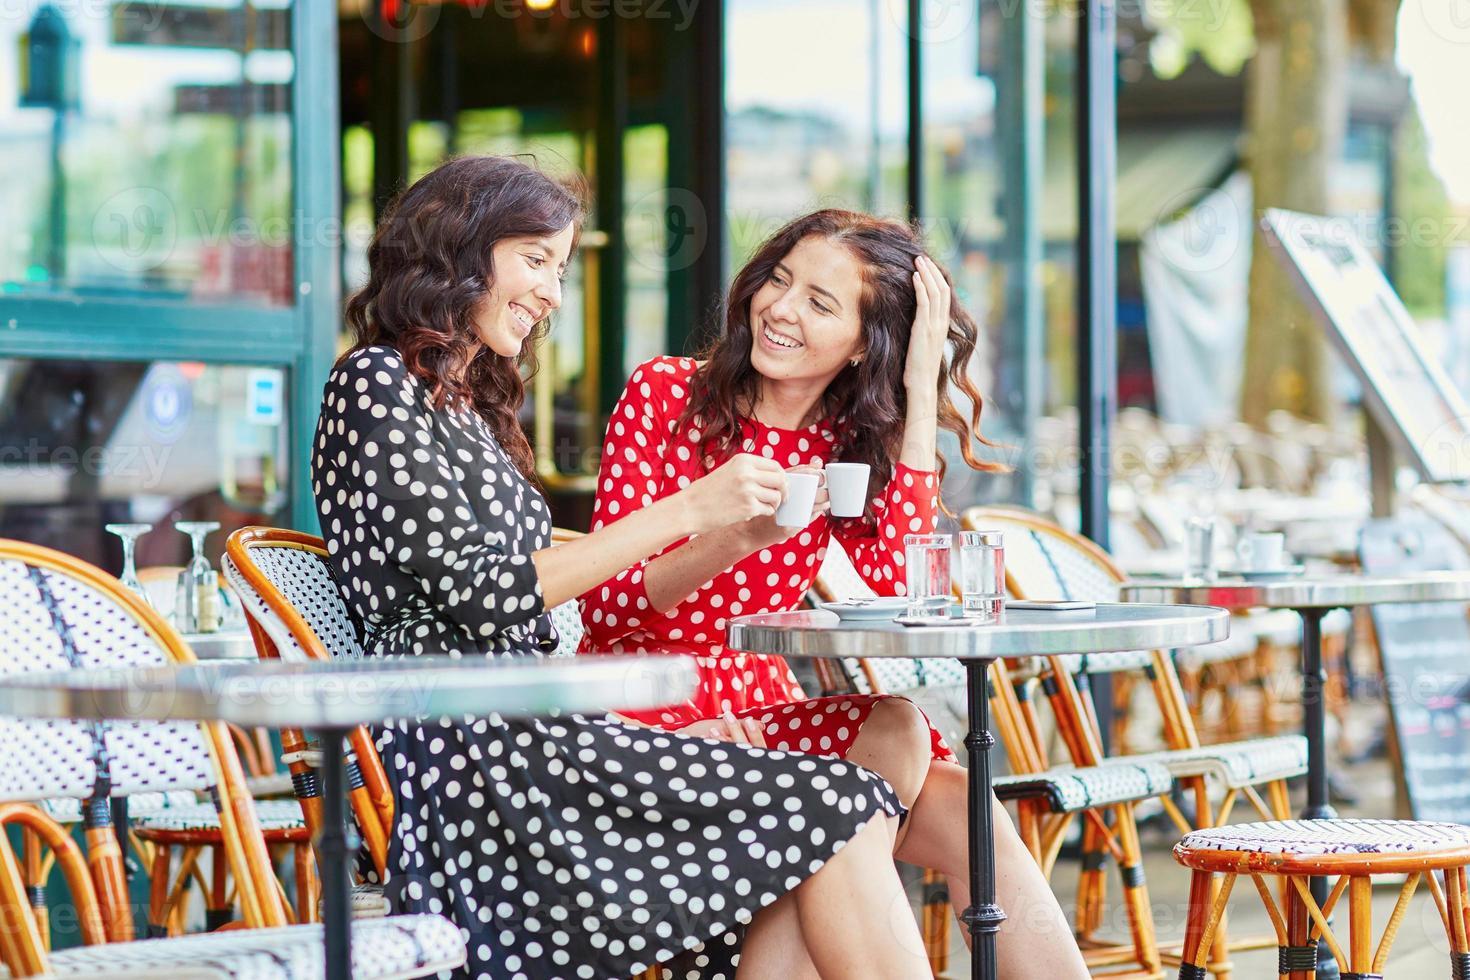 bellissime sorelle gemelle che bevono caffè foto